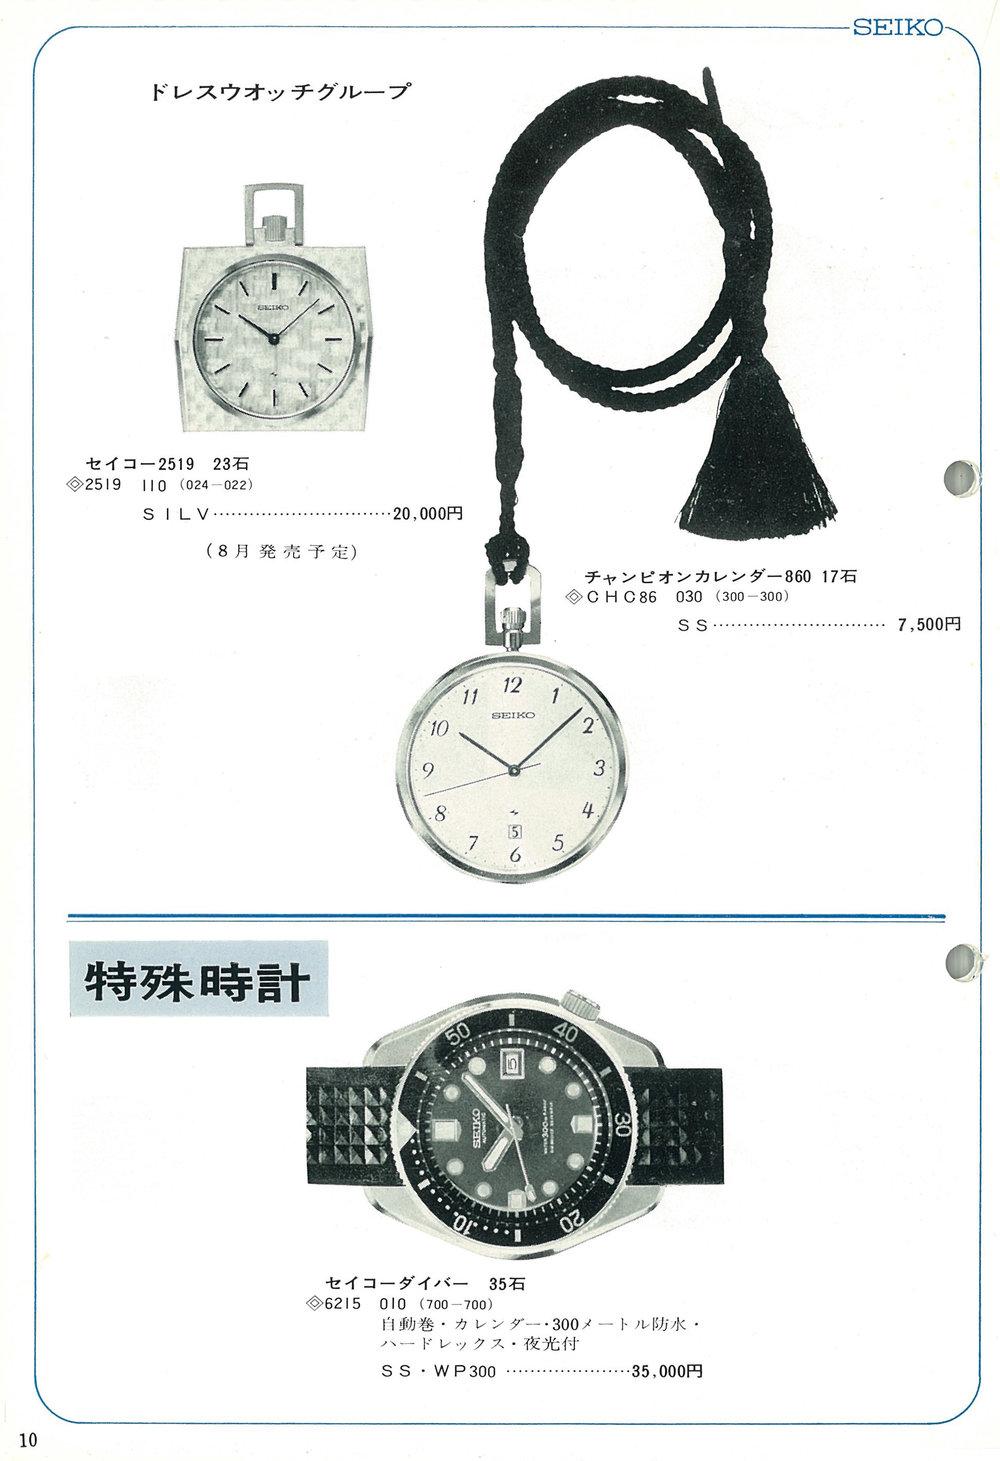 1967 Vol.2 Seiko JDM Supplement